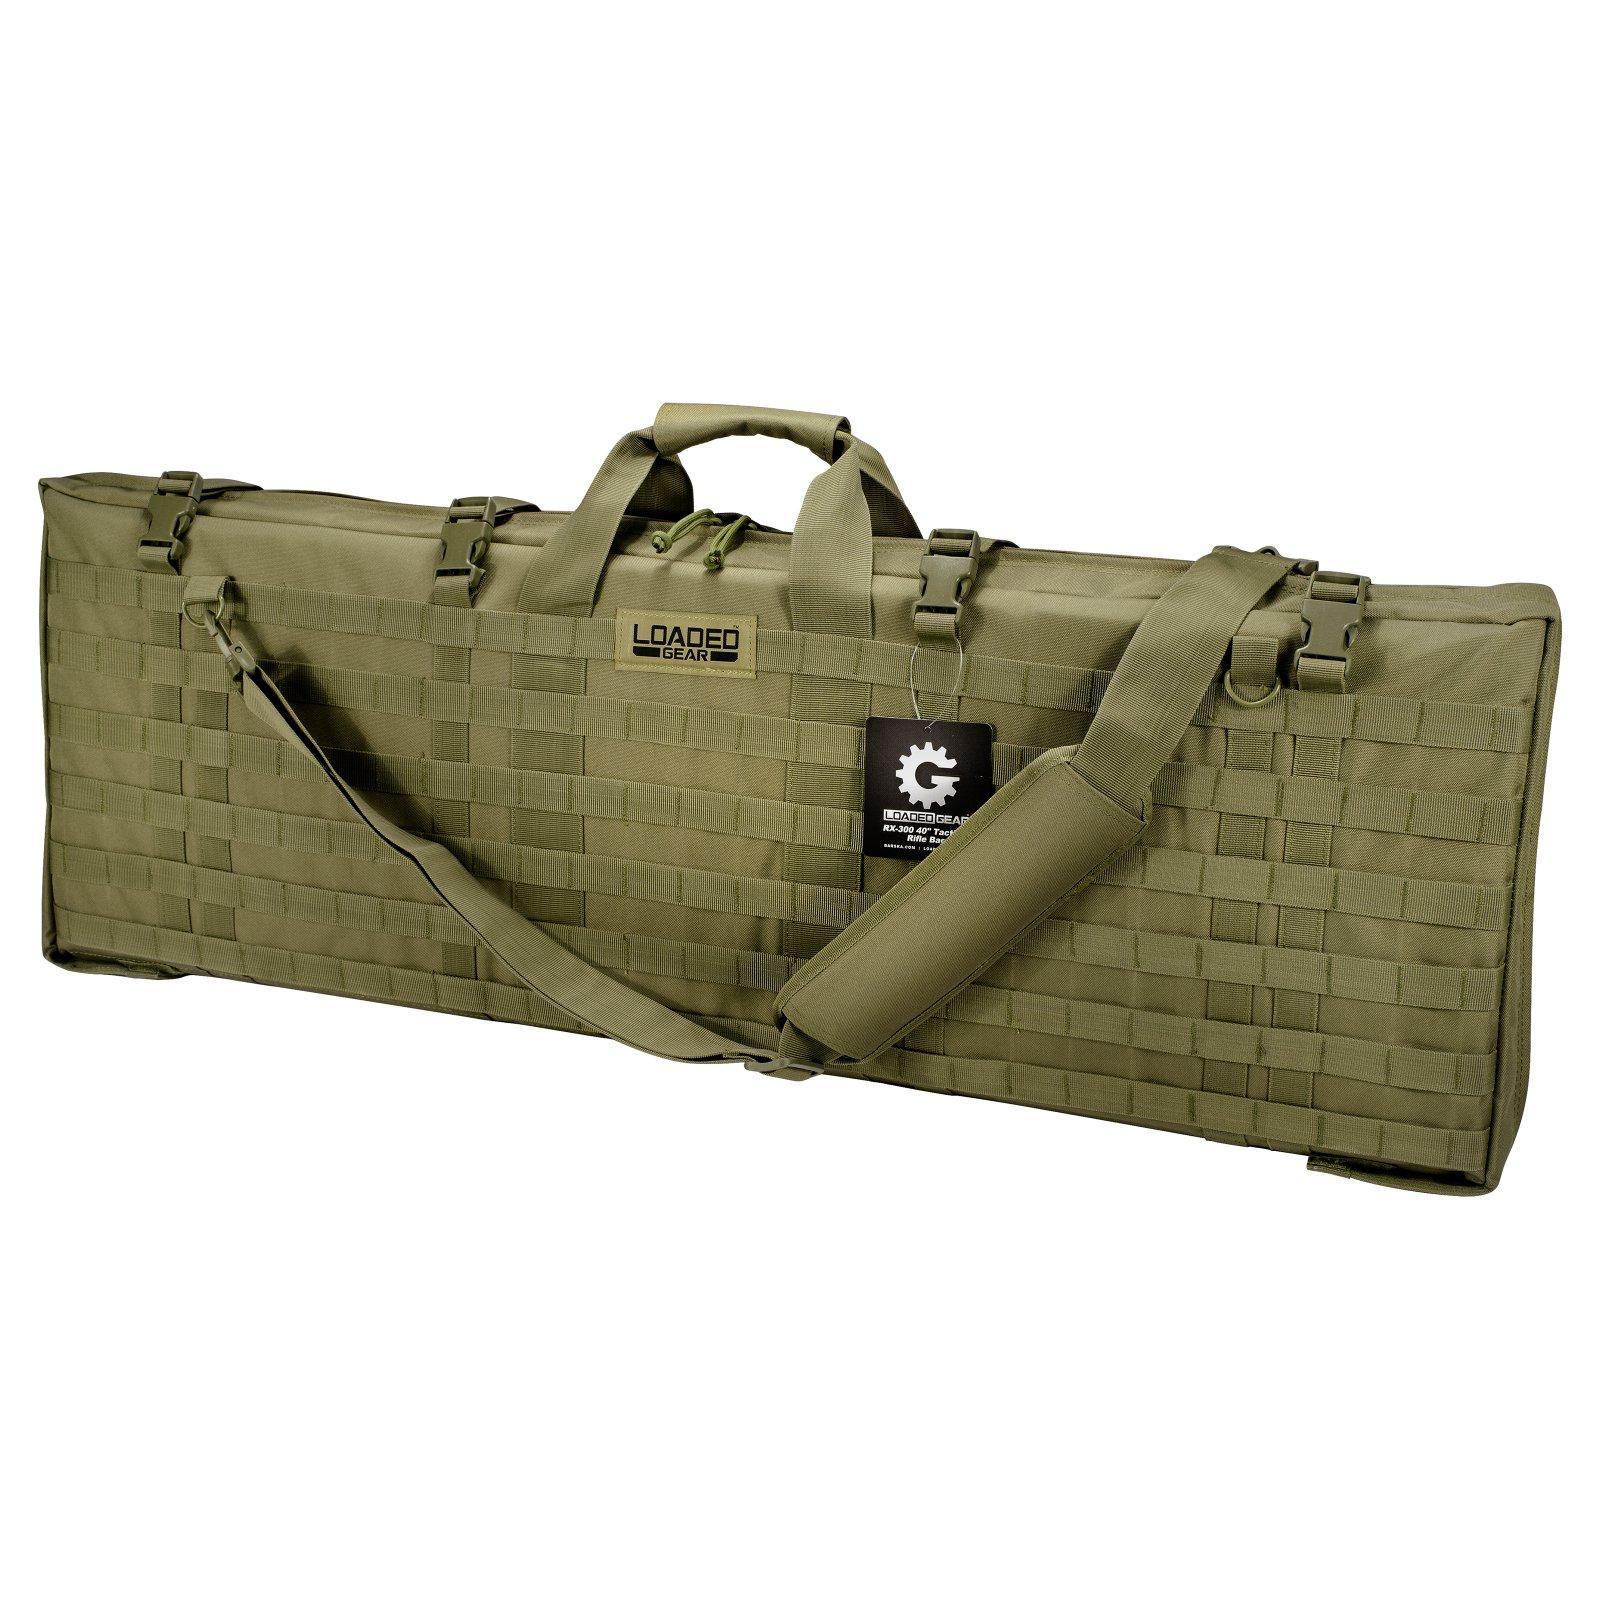 "Barska Optics Loaded Gear RX-300 40"" Tactical Rifle Bag, Green"